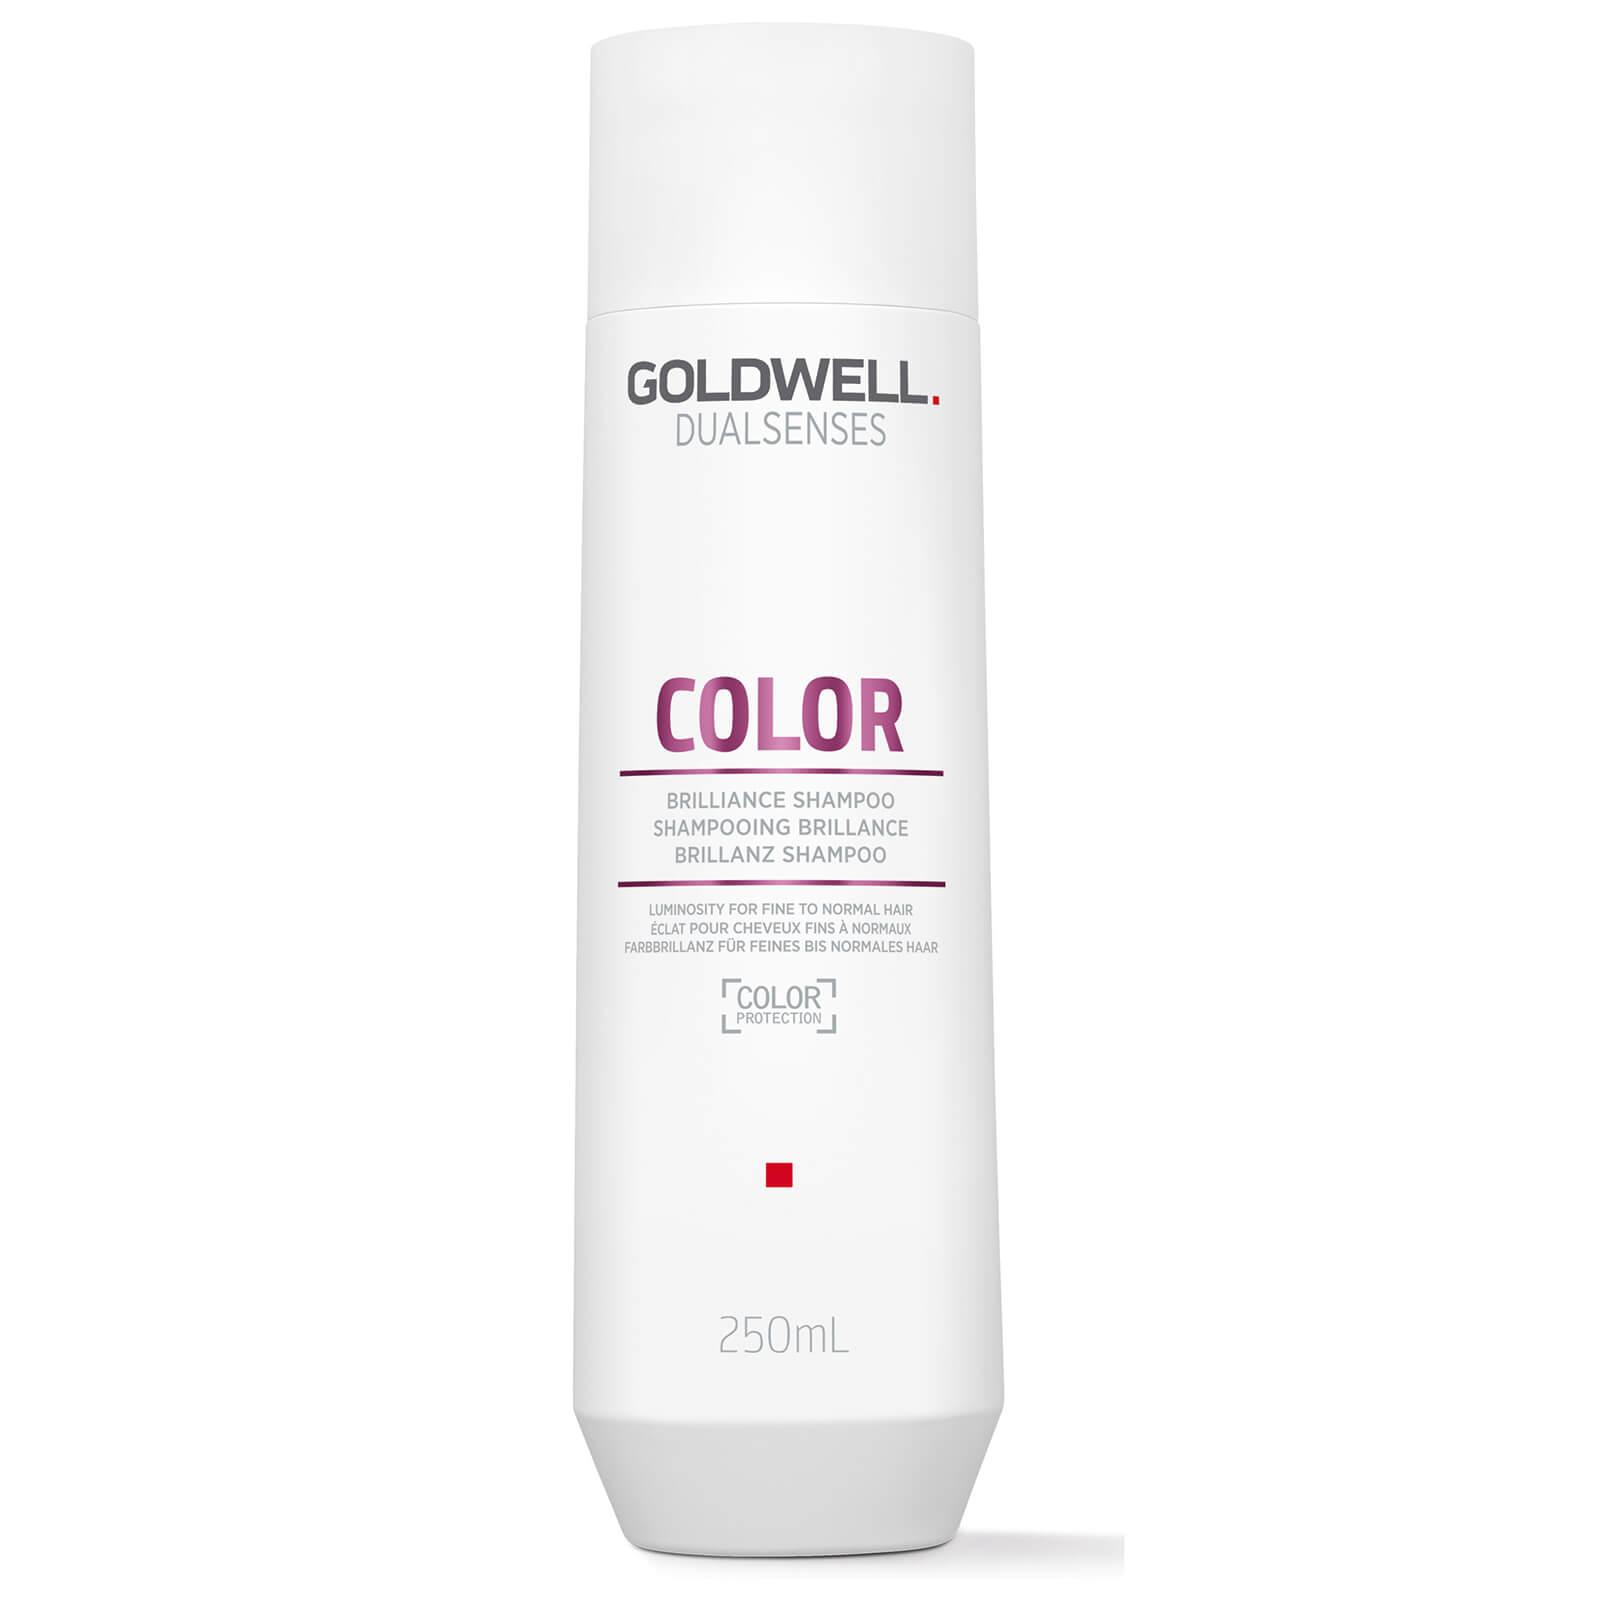 Goldwell Color Brilliance Shampoo 250ml